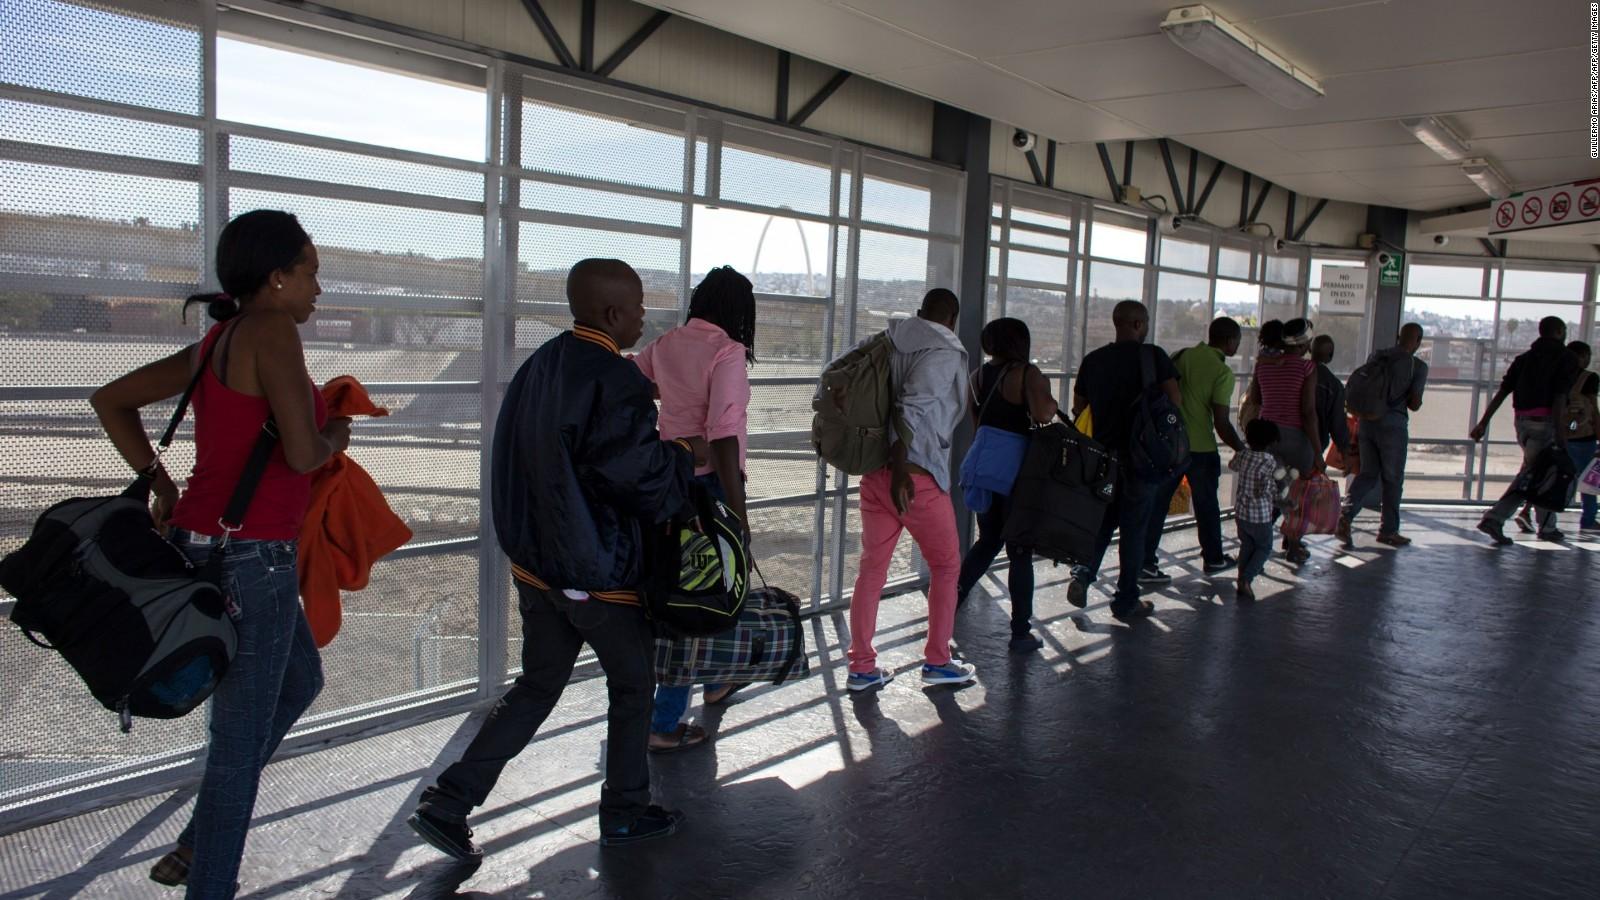 México registra aumento de solicitudes de asilo de ciudadanos de Haití